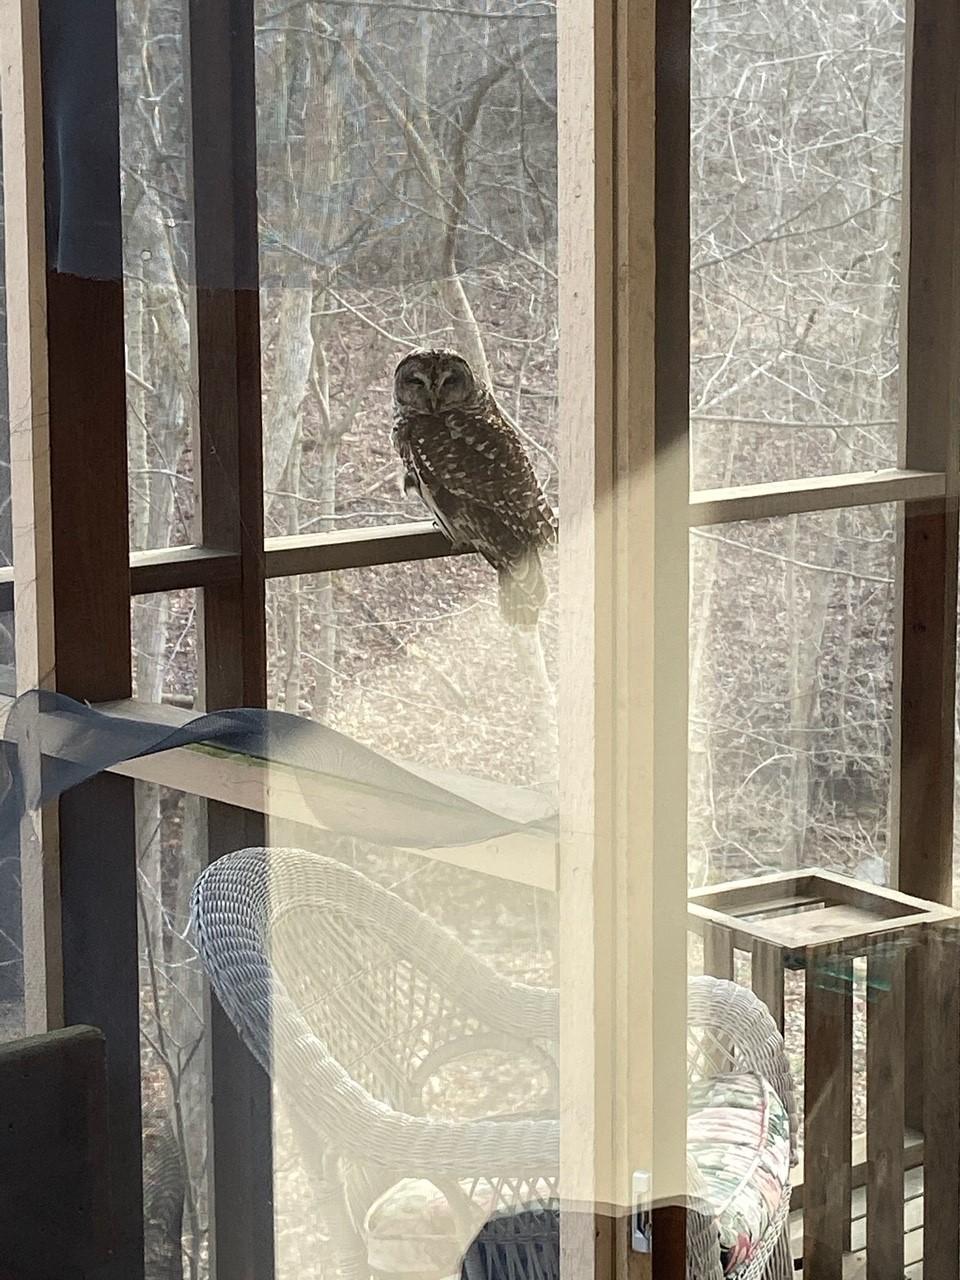 Owl_Maura